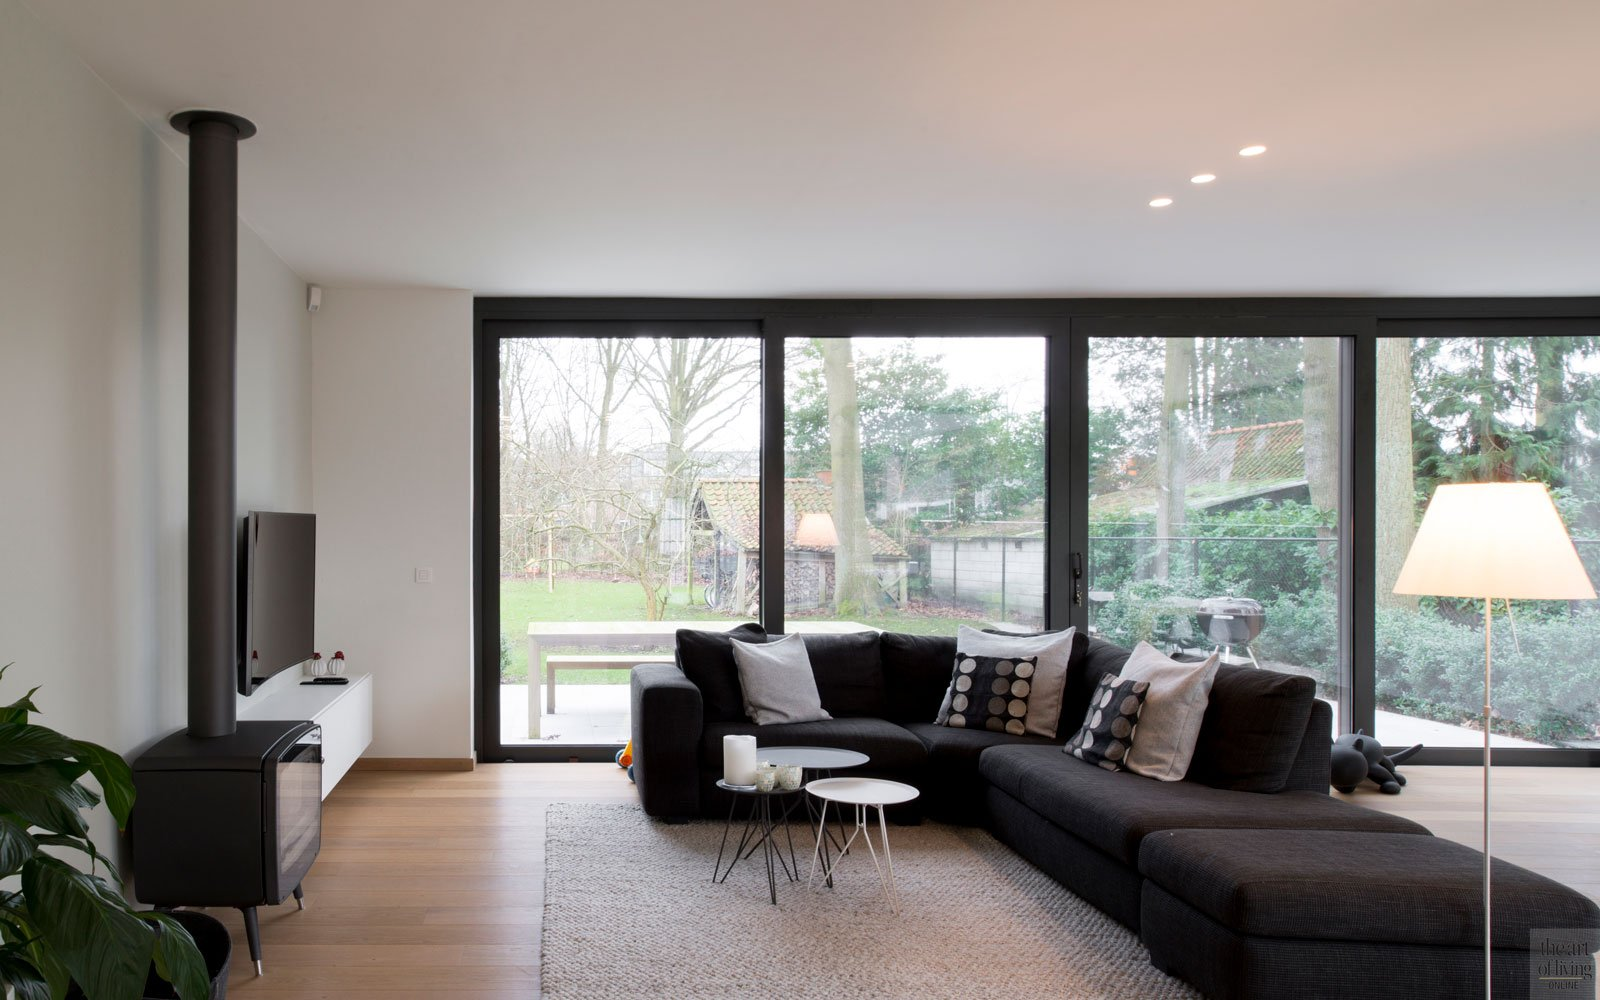 Woonkamer, kachel, hoekbank, grote ramen, houten vloer, living, moderne villa, Leers & Partners